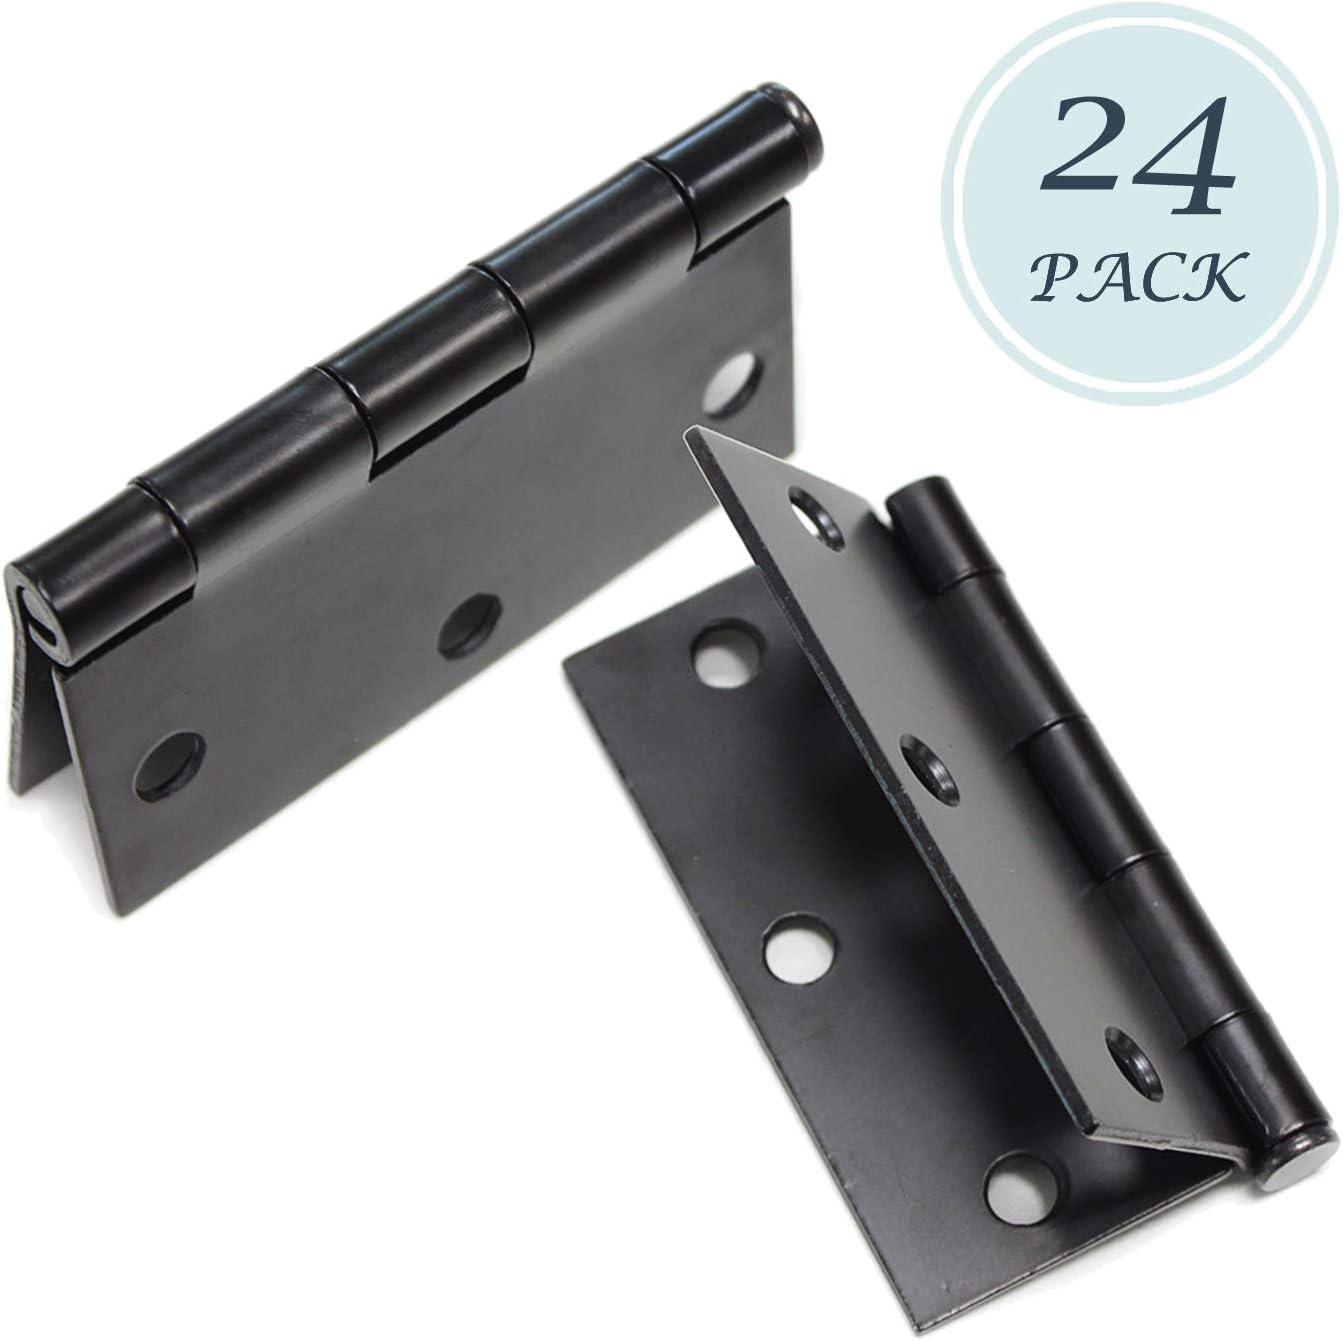 Set of 30 Hinges Door Hinges 3.5 x 3.5 Extruded Solid Brass Hinge Black Architectural Grade 1//4 Radius Corners